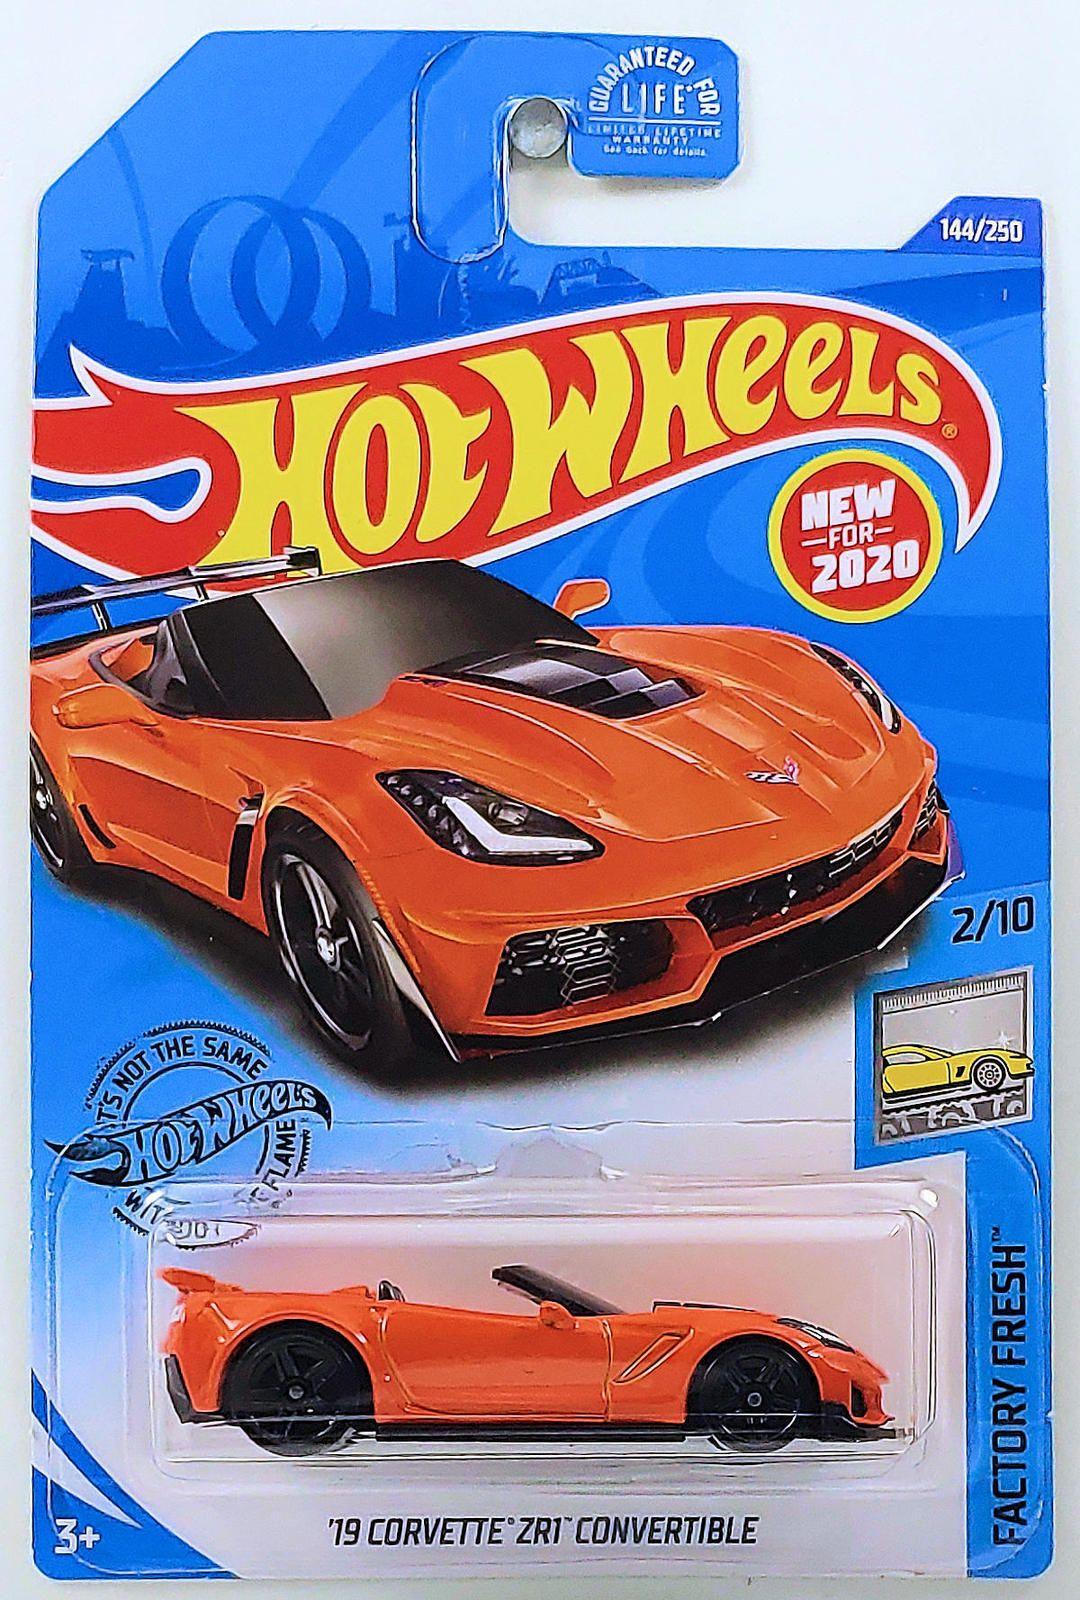 Hot Wheels Chevy Corvette ZR1 Conv 2019 Orange 144//250 1//64